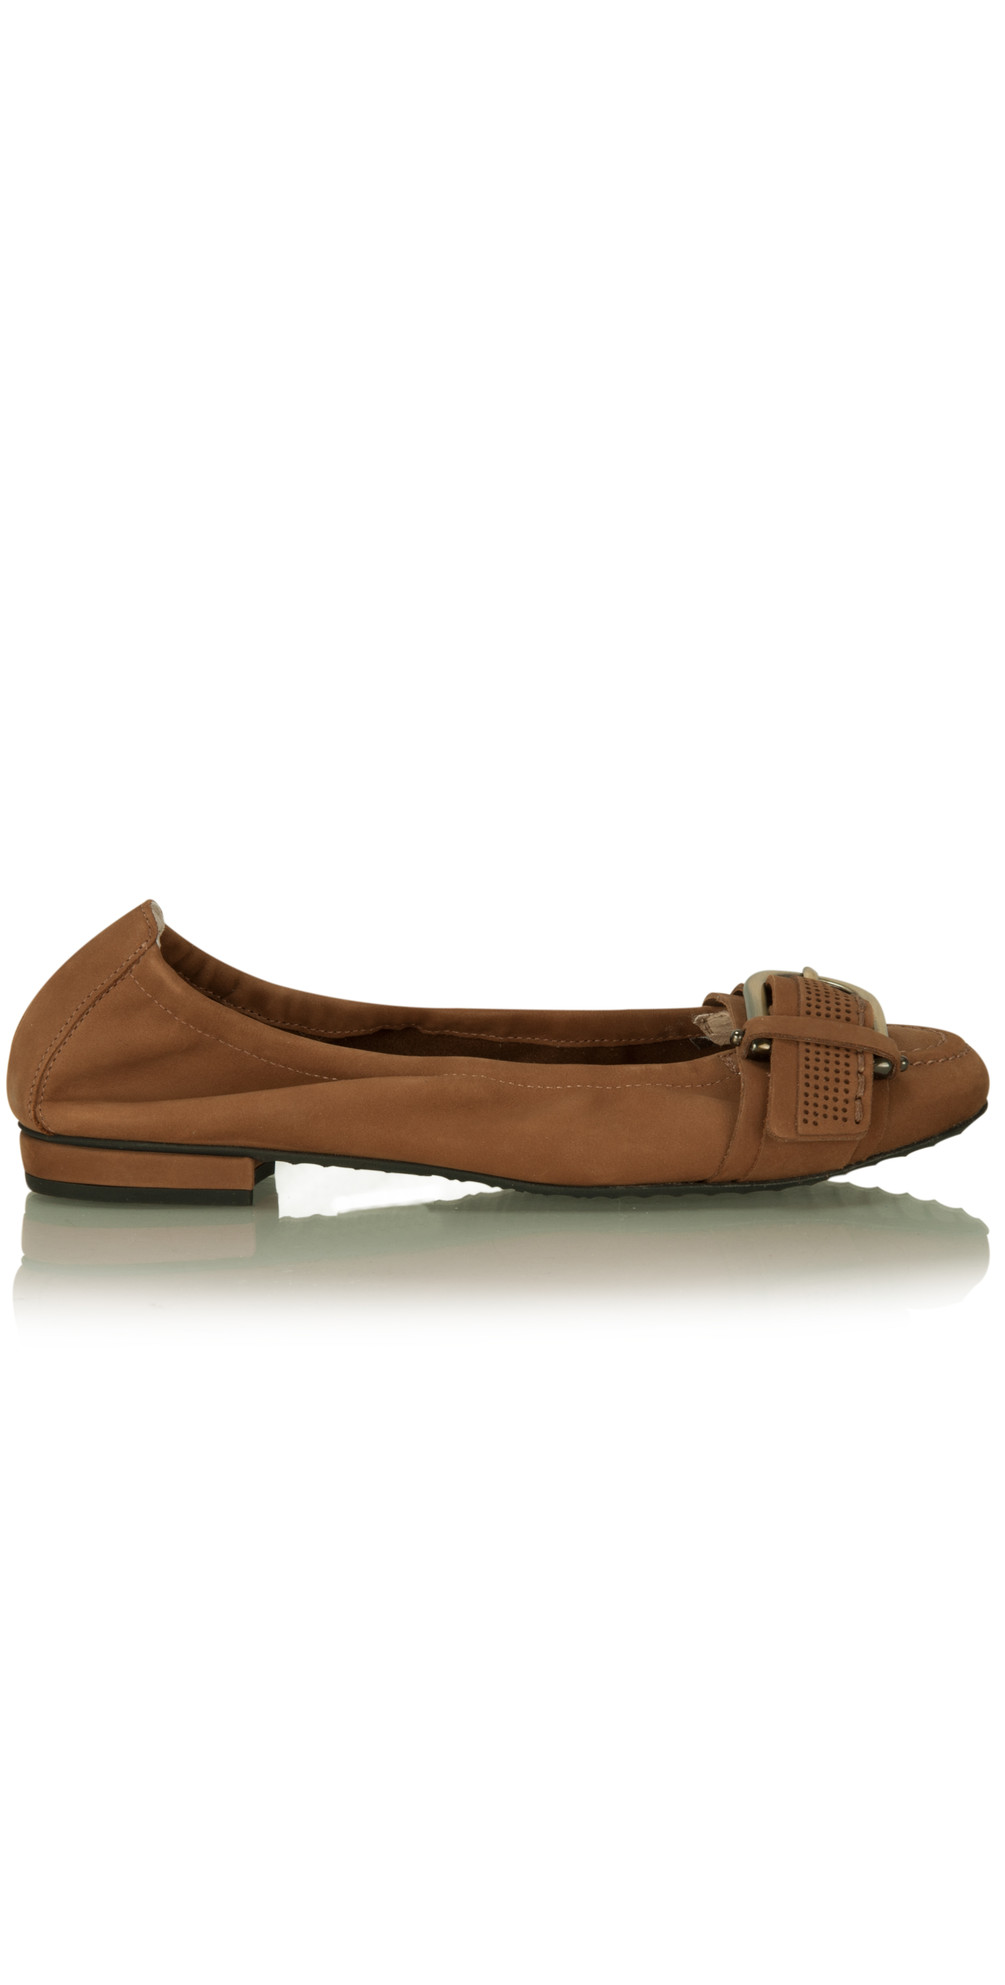 kennel und schmenger malu nubuk buckle shoe in cognac. Black Bedroom Furniture Sets. Home Design Ideas